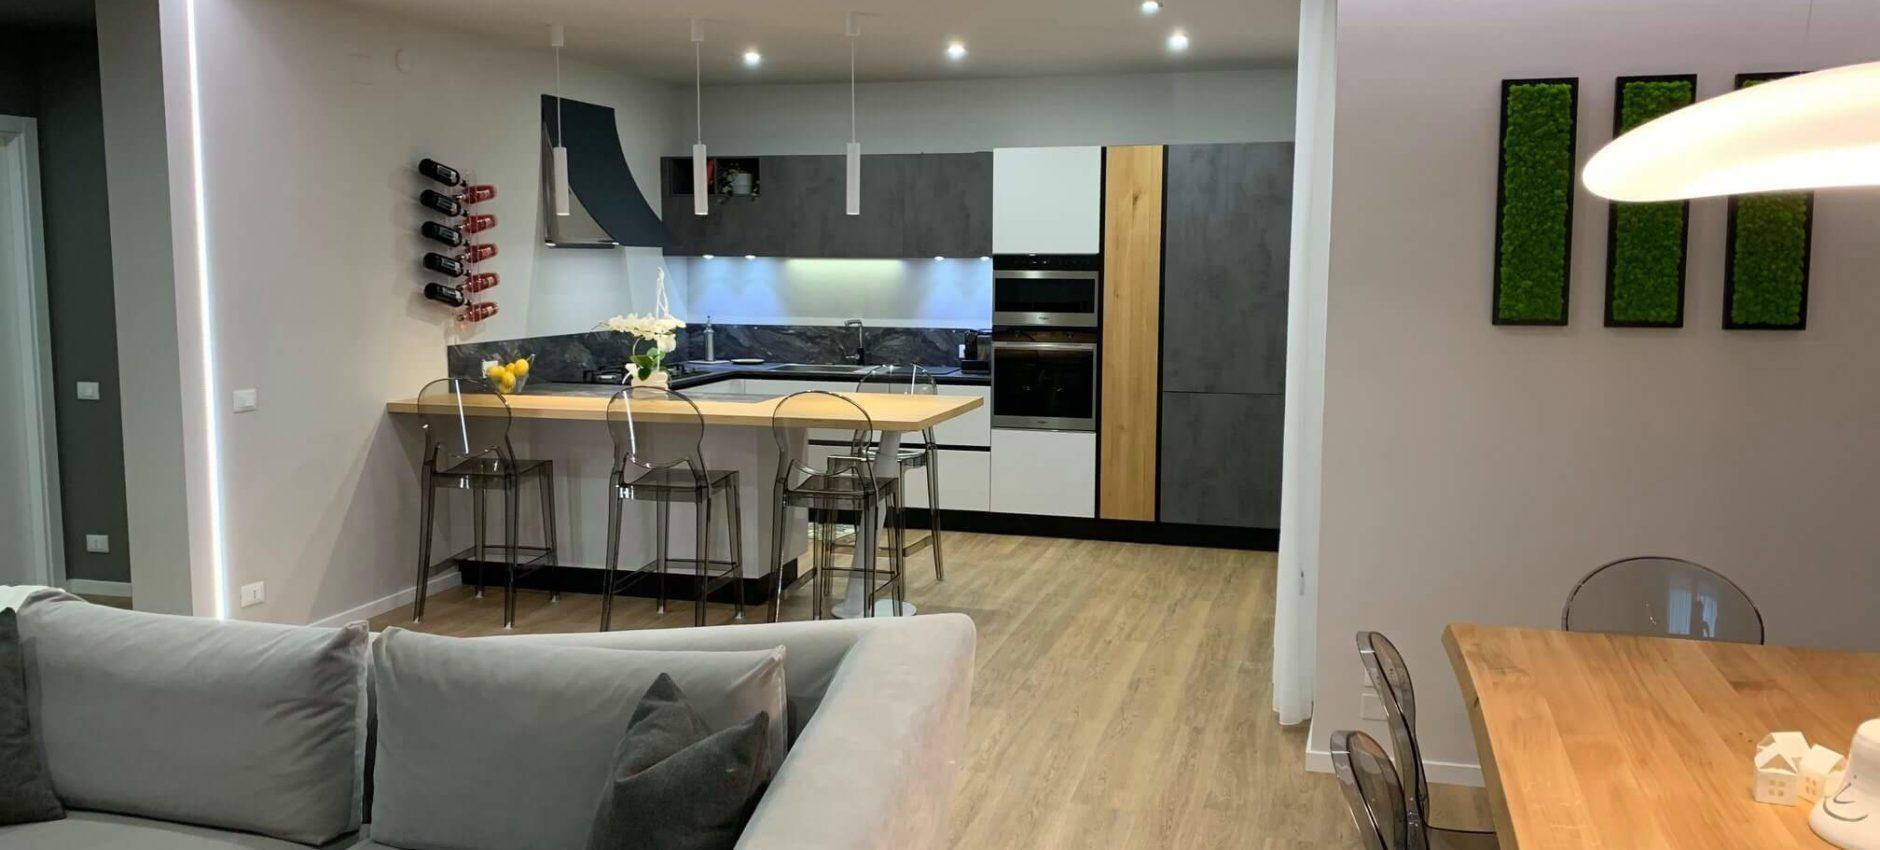 Cucina Creo Kitchens Living Orme Design